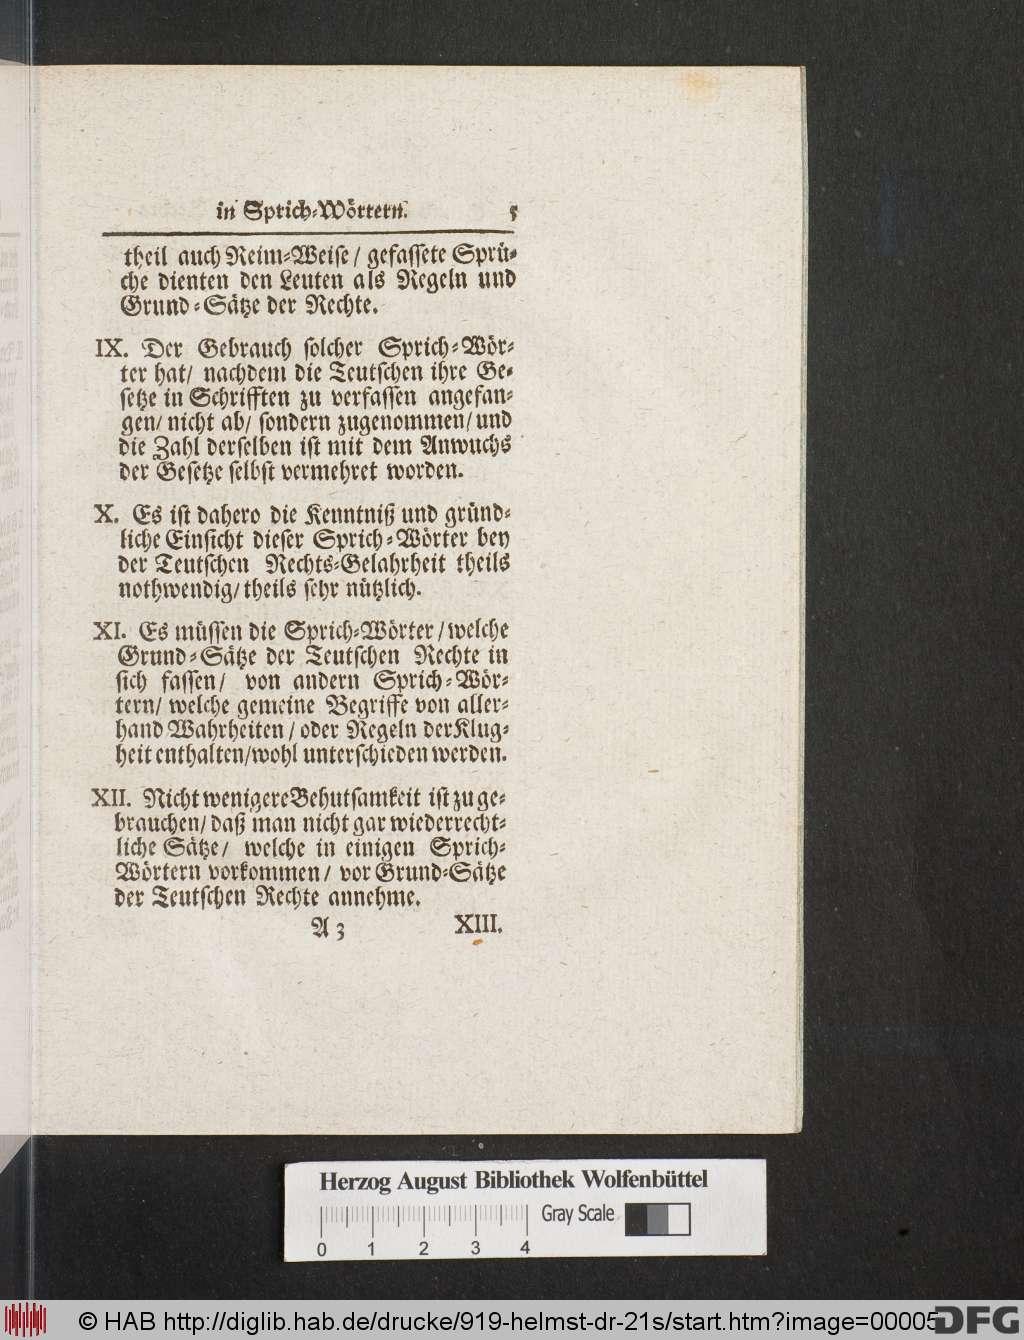 https://diglib.hab.de/drucke/919-helmst-dr-21s/00005.jpg